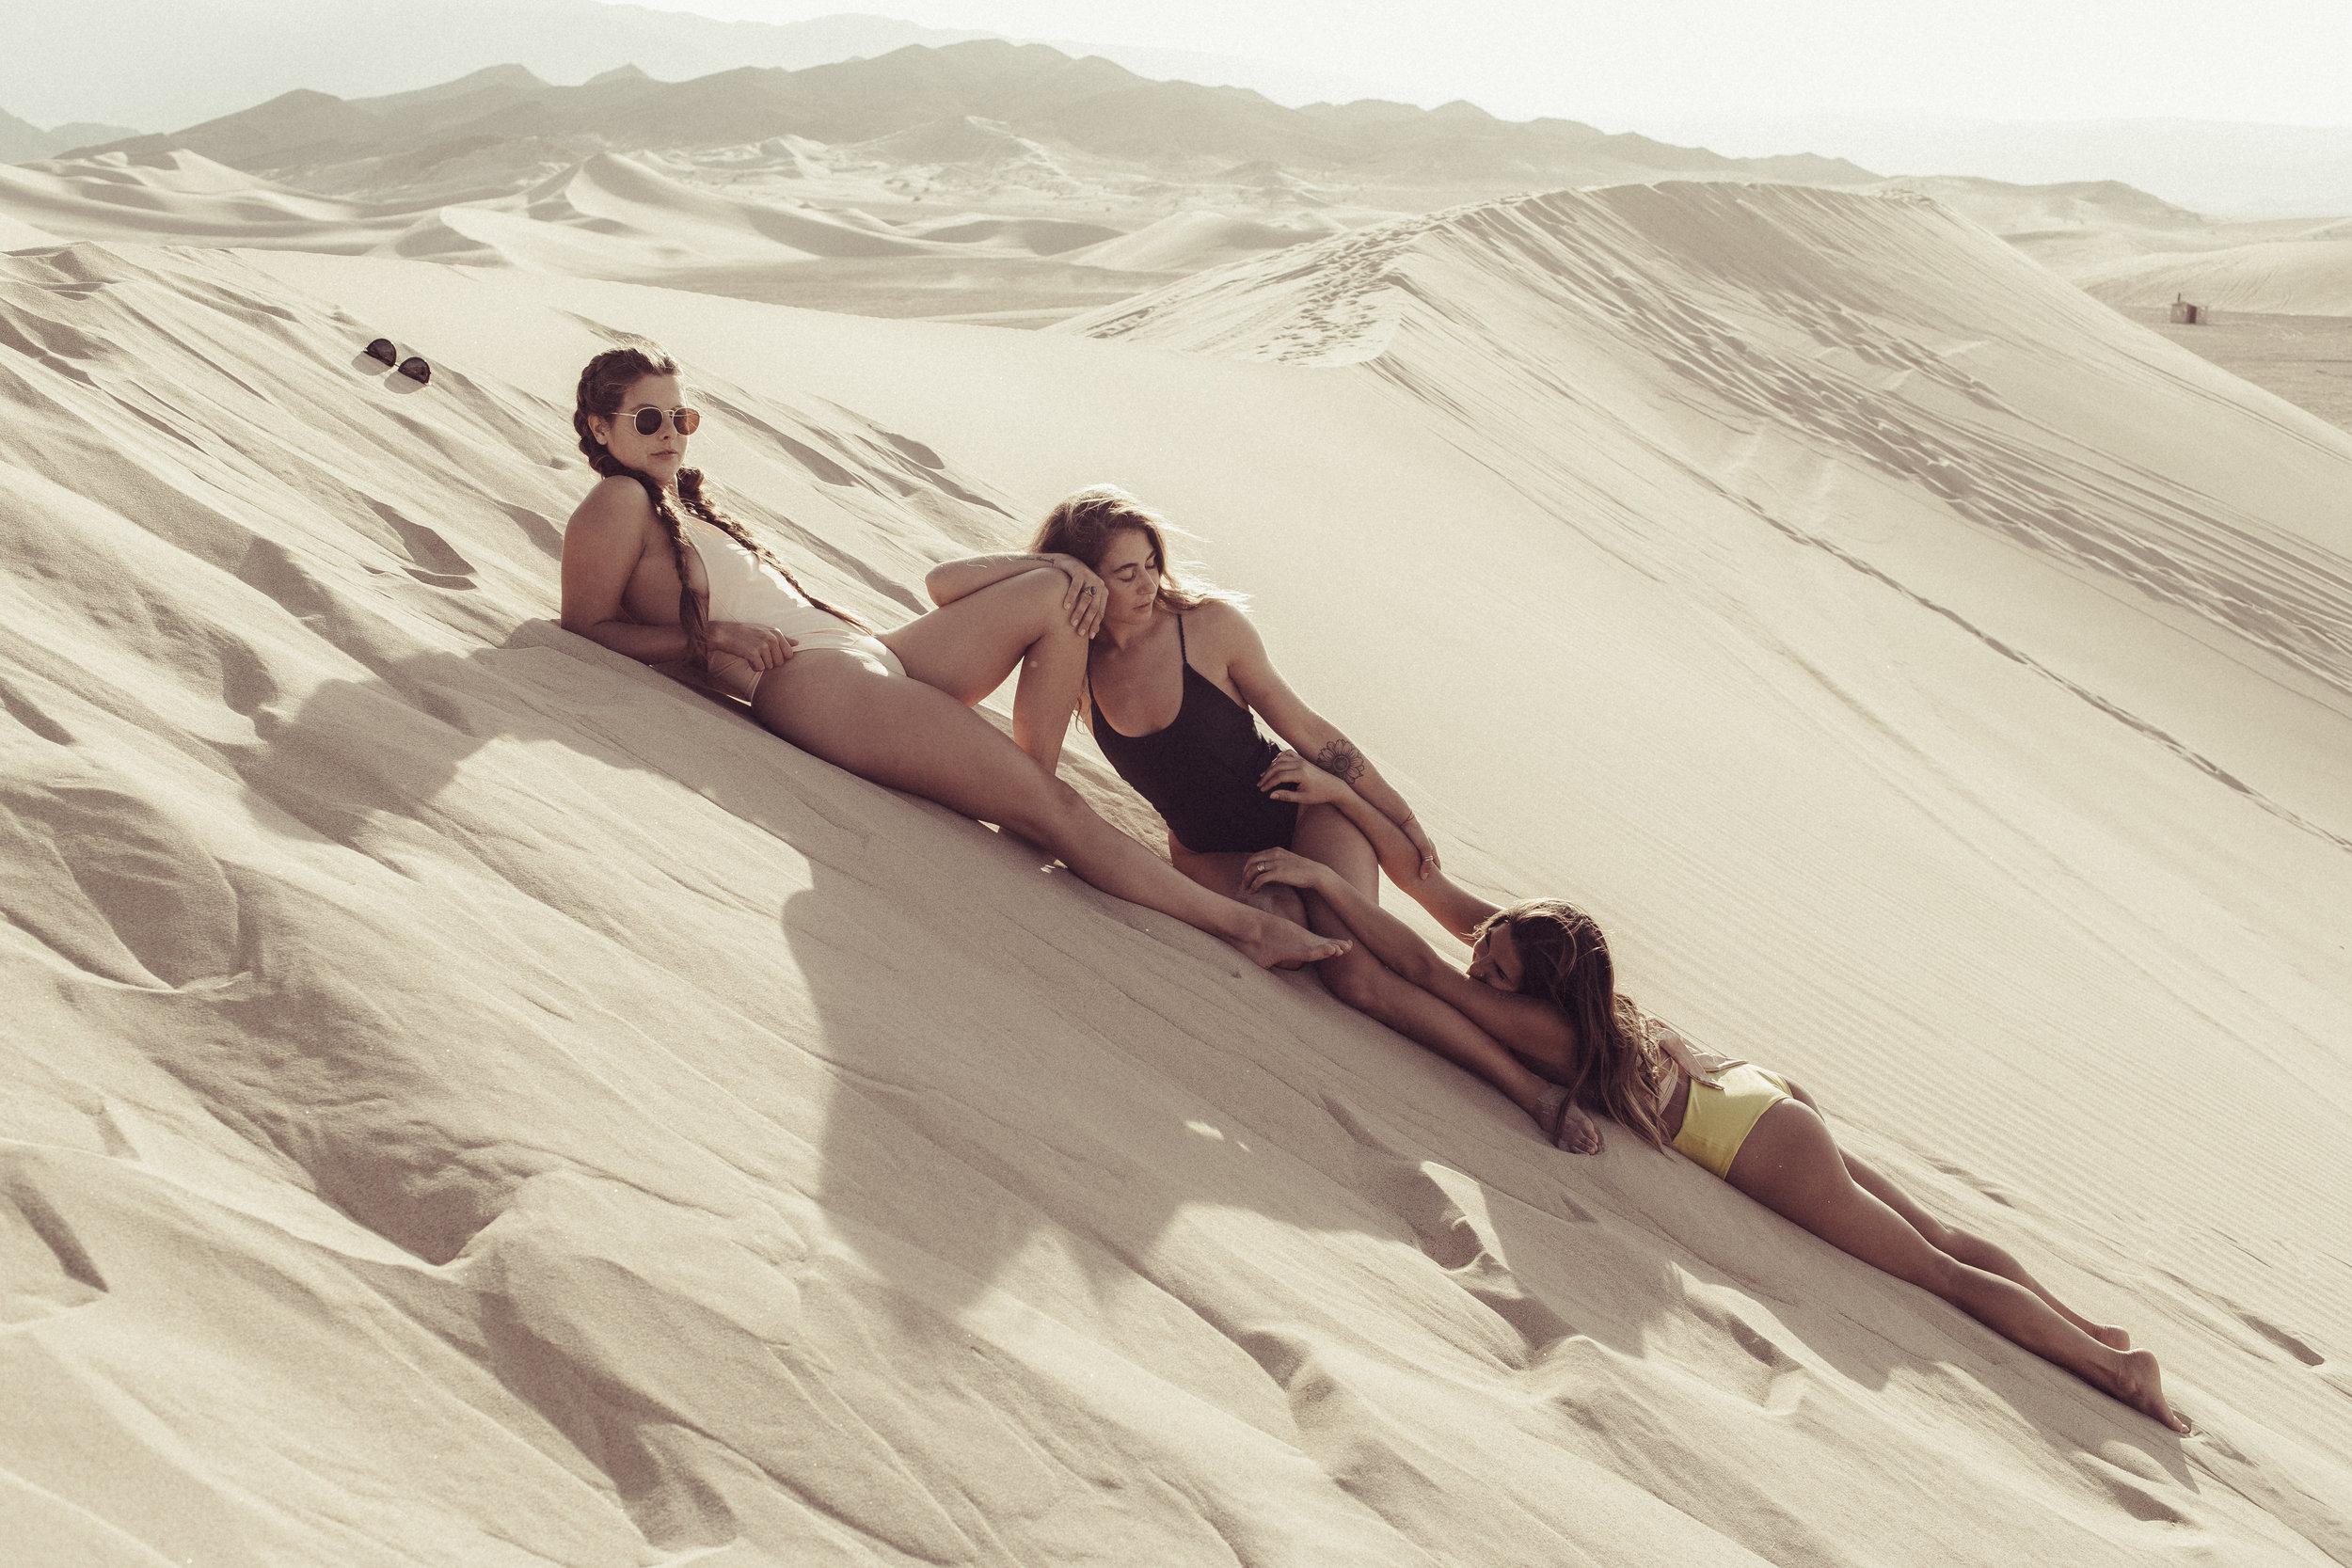 sirena-dunes--5287-2.jpg